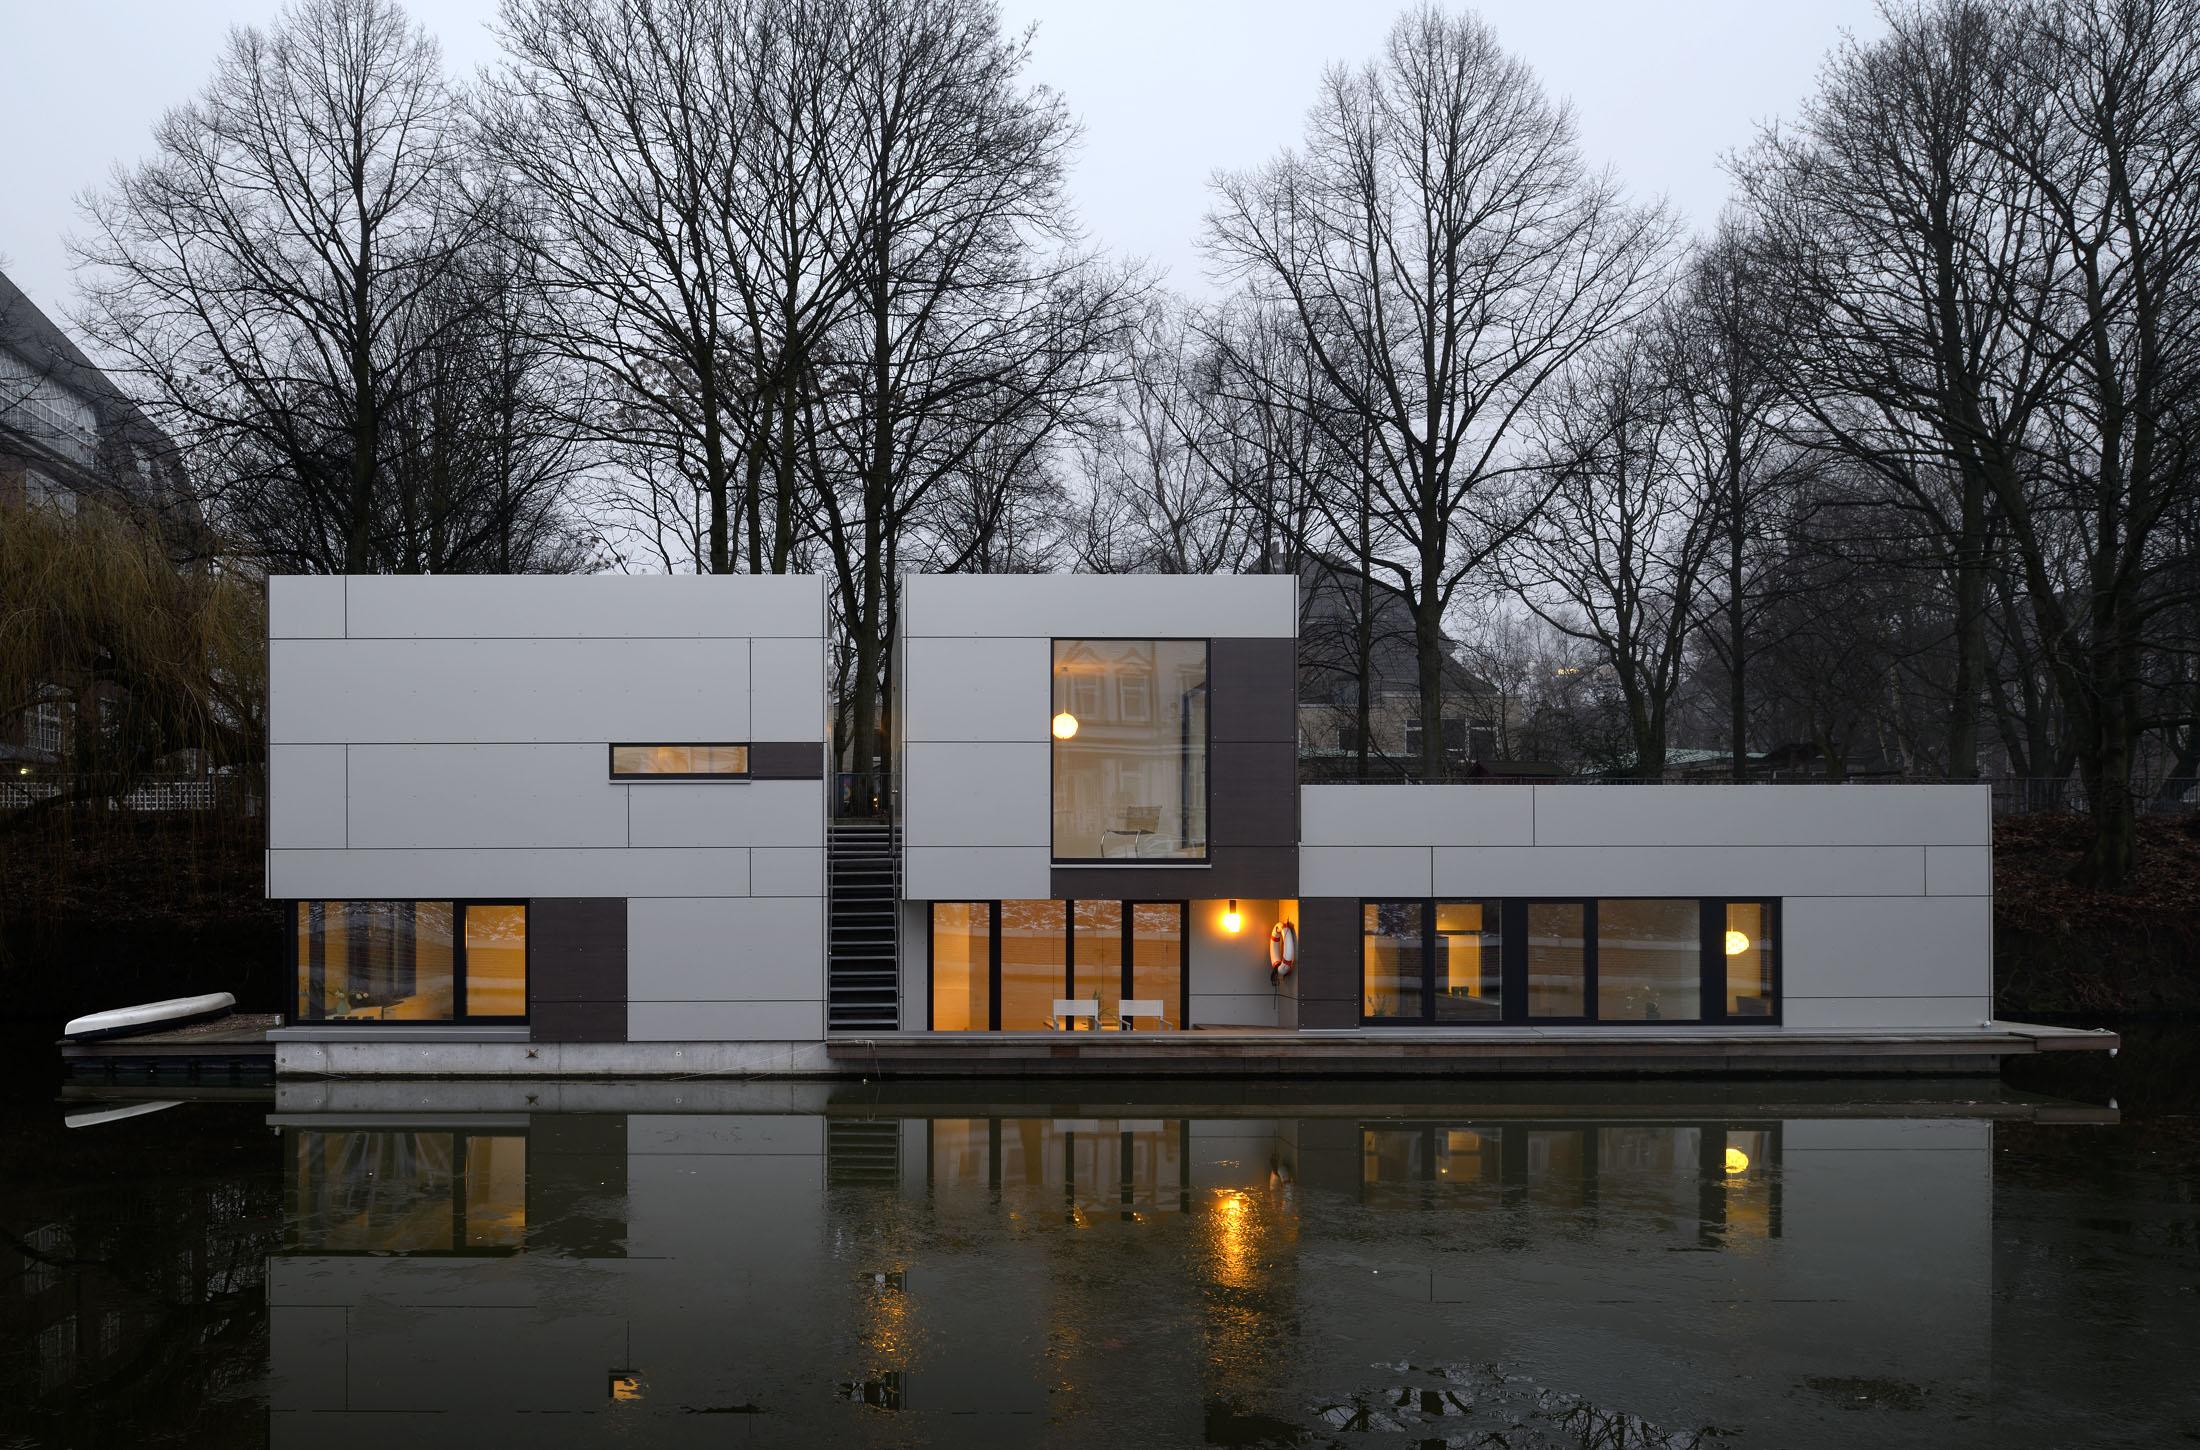 Hausboot Am Eilbekkanal Hamburg Dfz Architekten